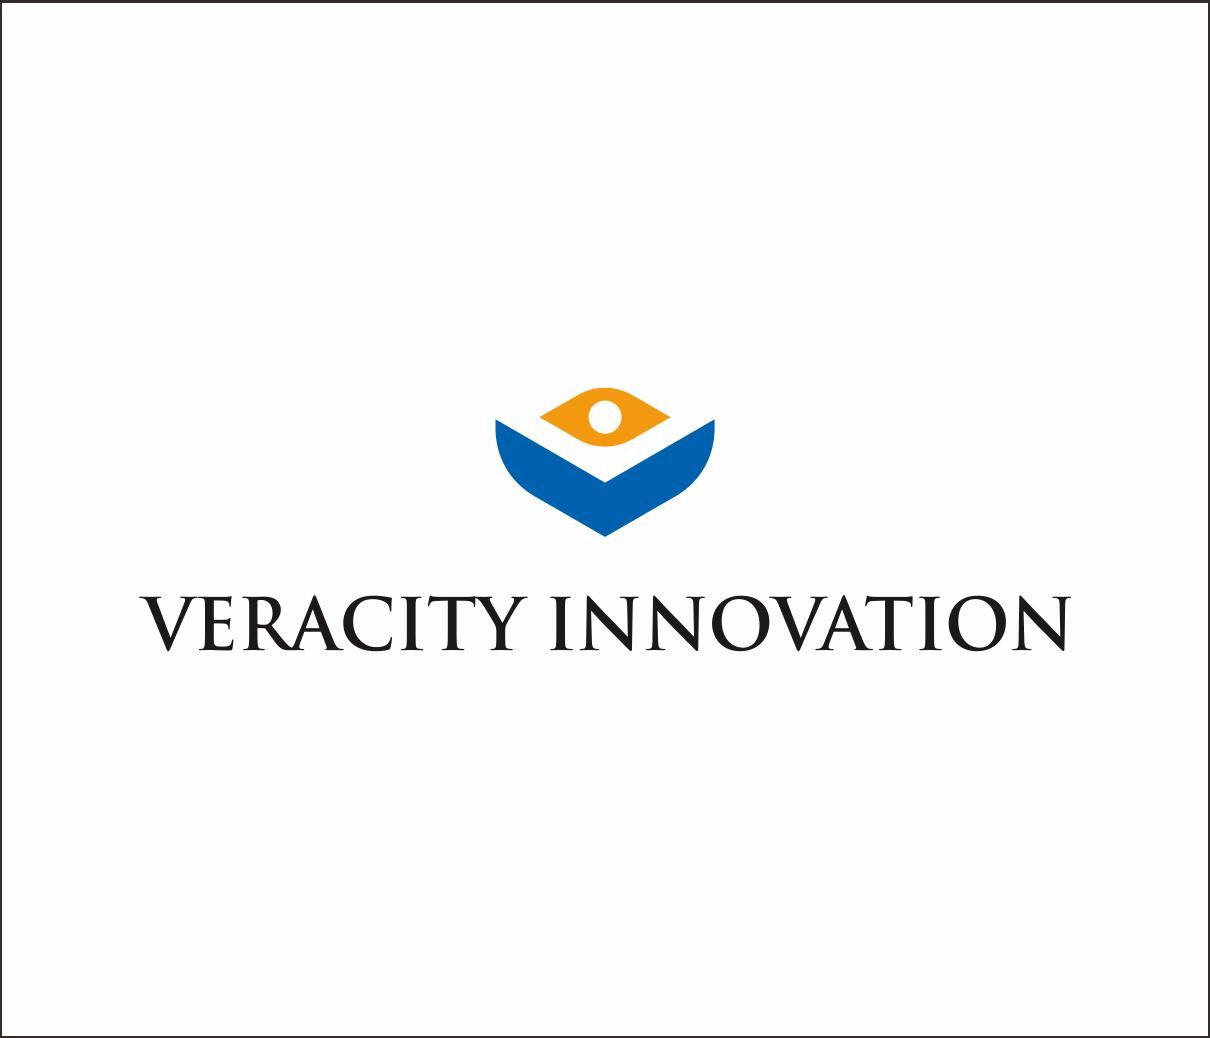 Logo Design by Armada Jamaluddin - Entry No. 140 in the Logo Design Contest Creative Logo Design for Veracity Innovation, LLC.